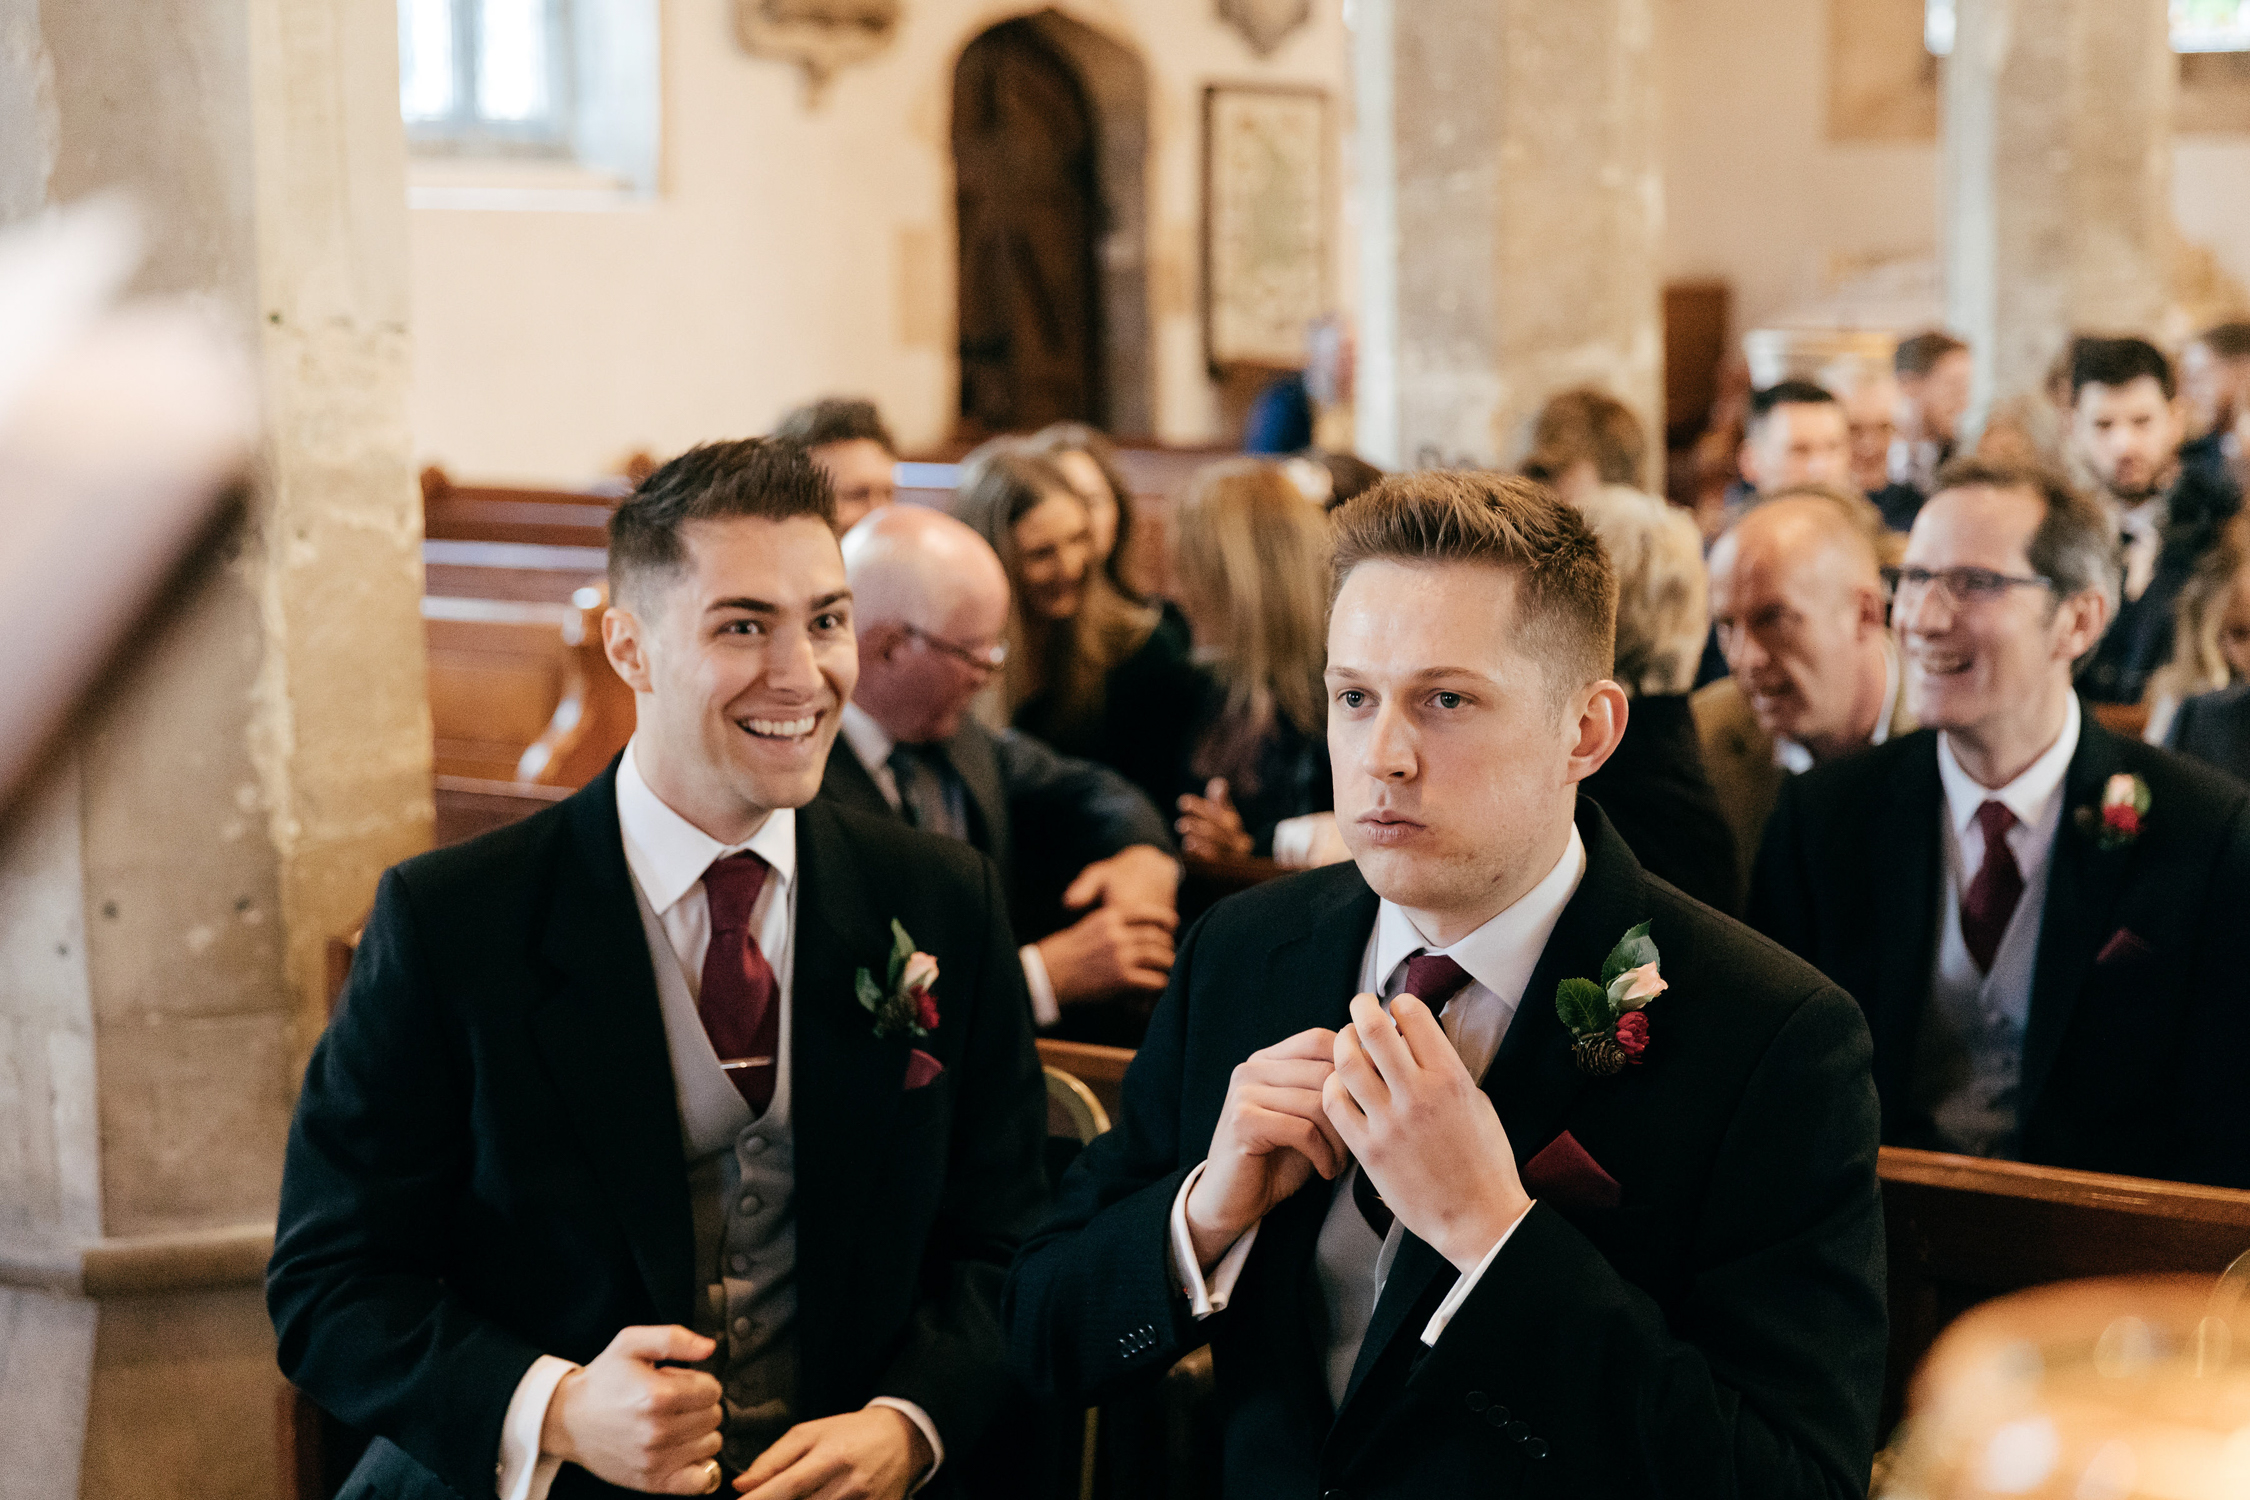 candid wedding photo of nervous groom